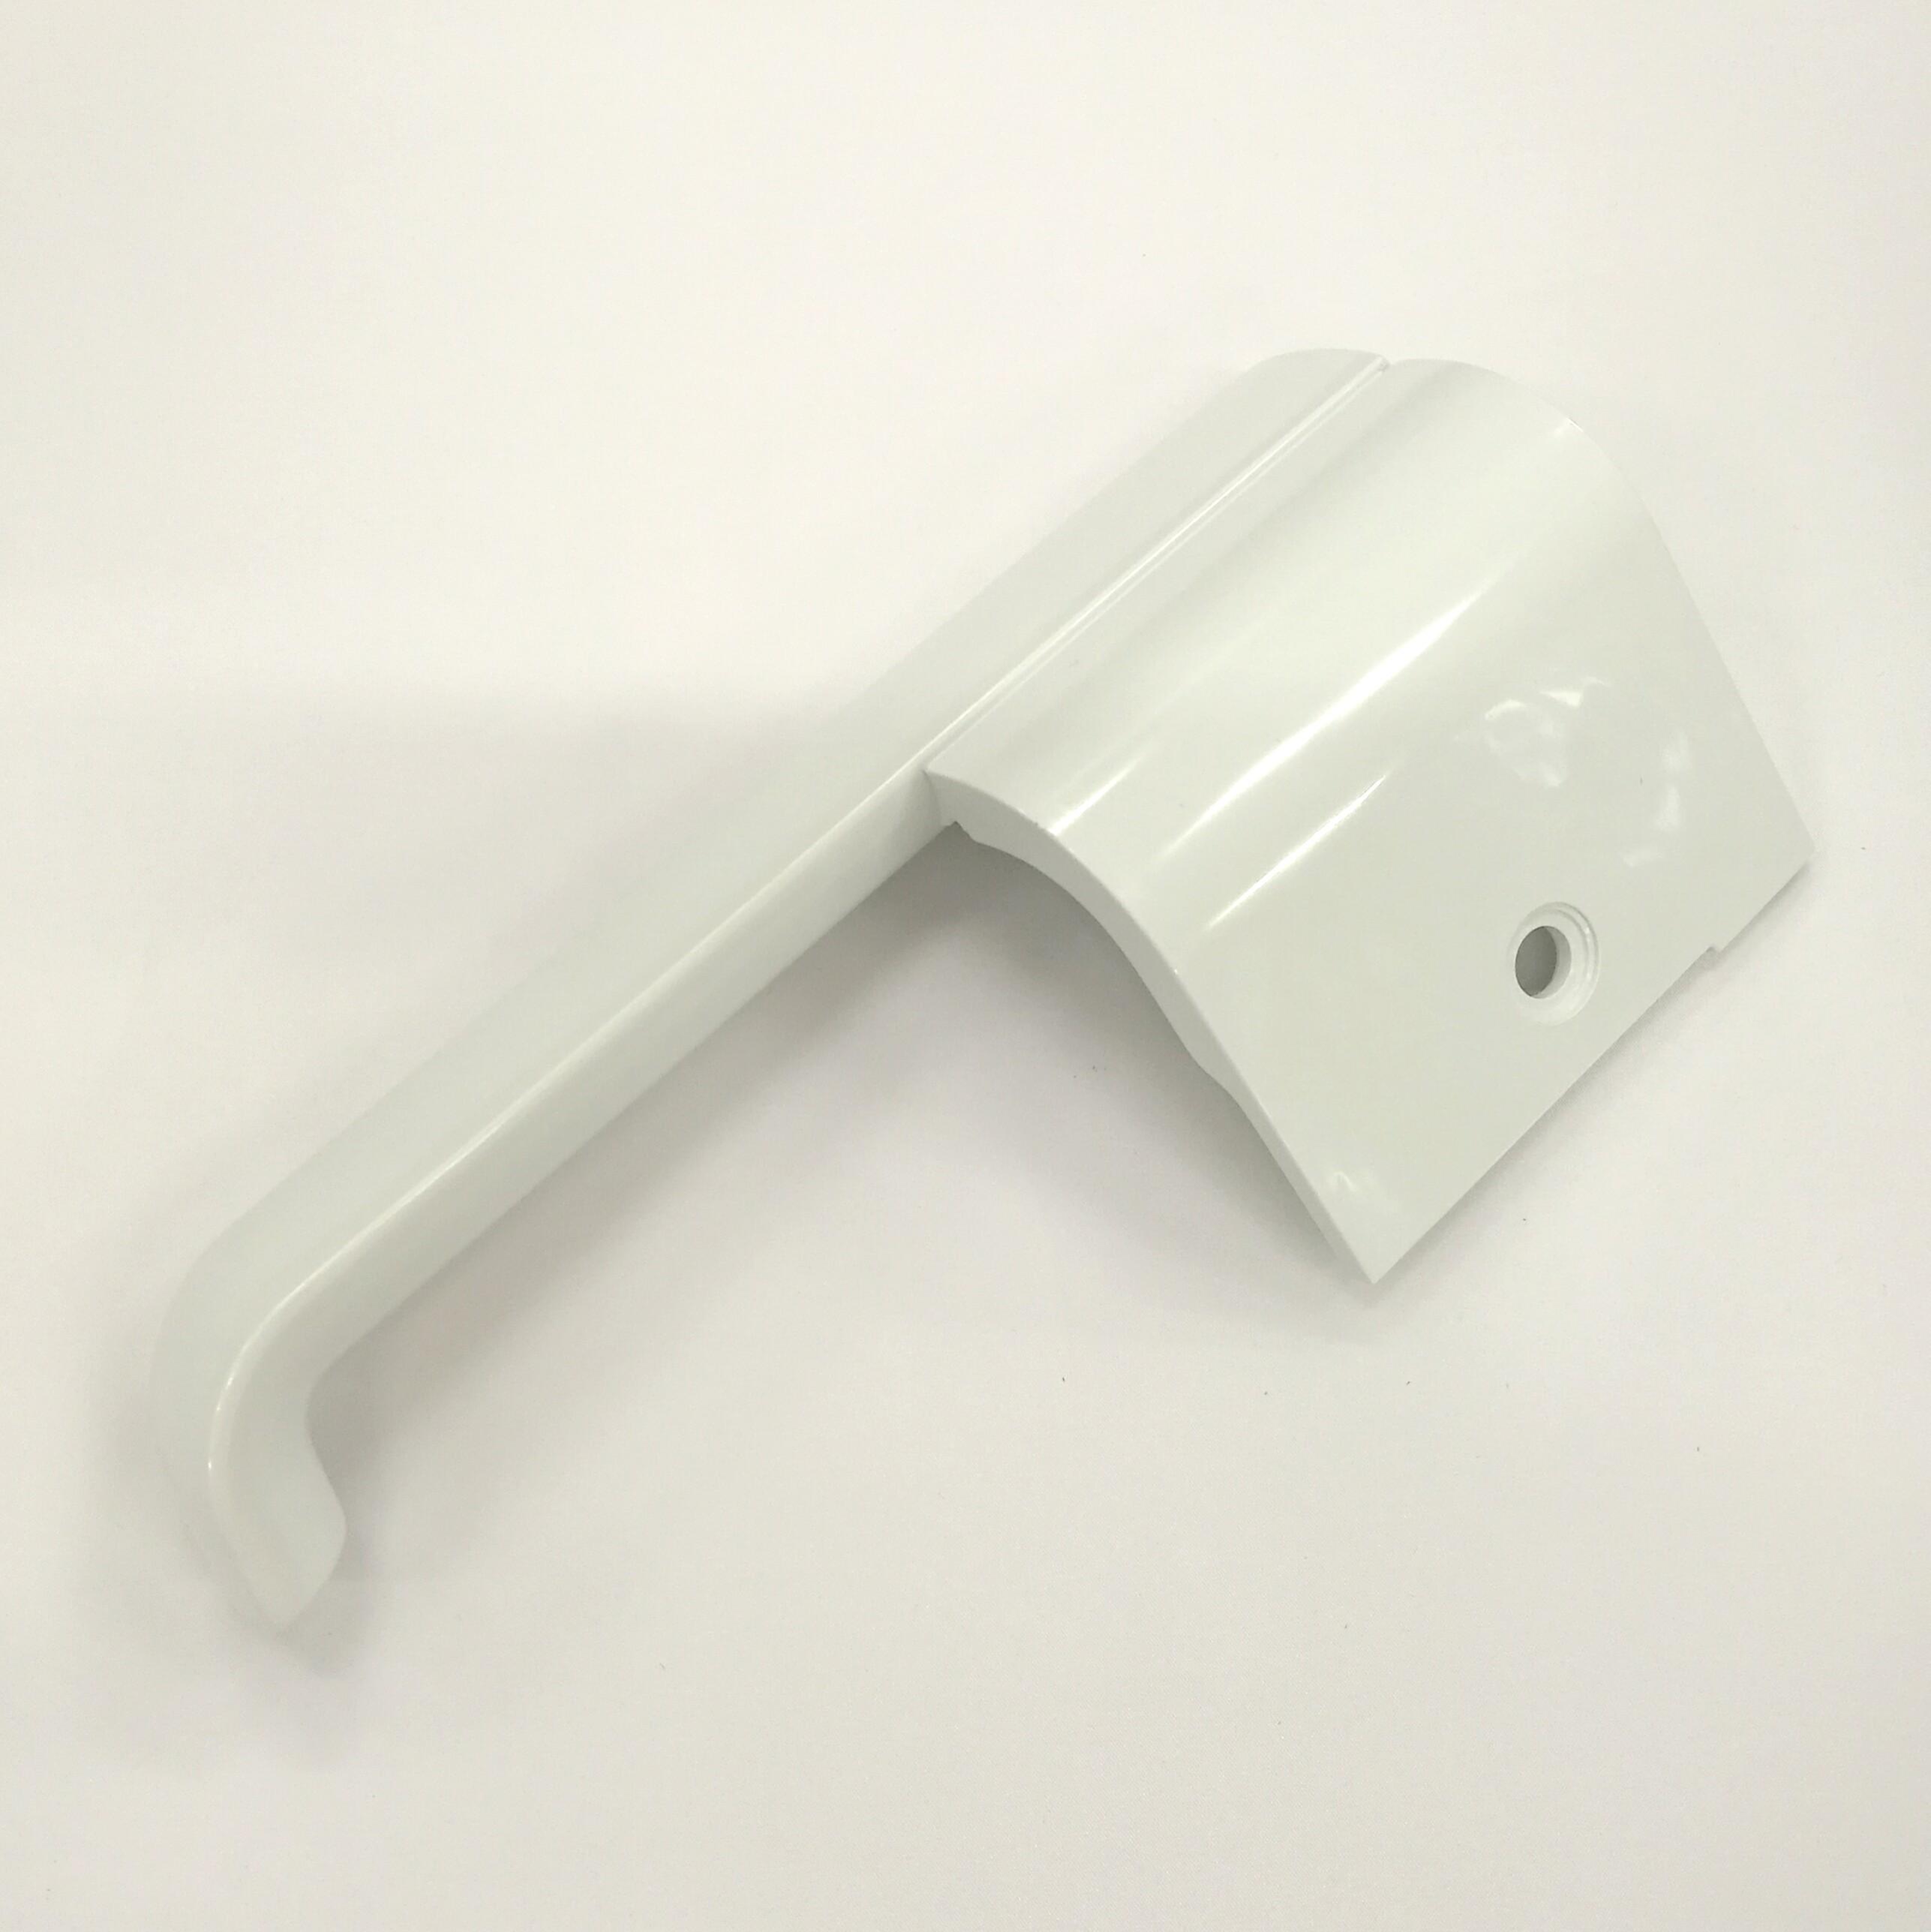 Bosch Siemens Fridge Freezer Handle 00491169 Sparestore Com